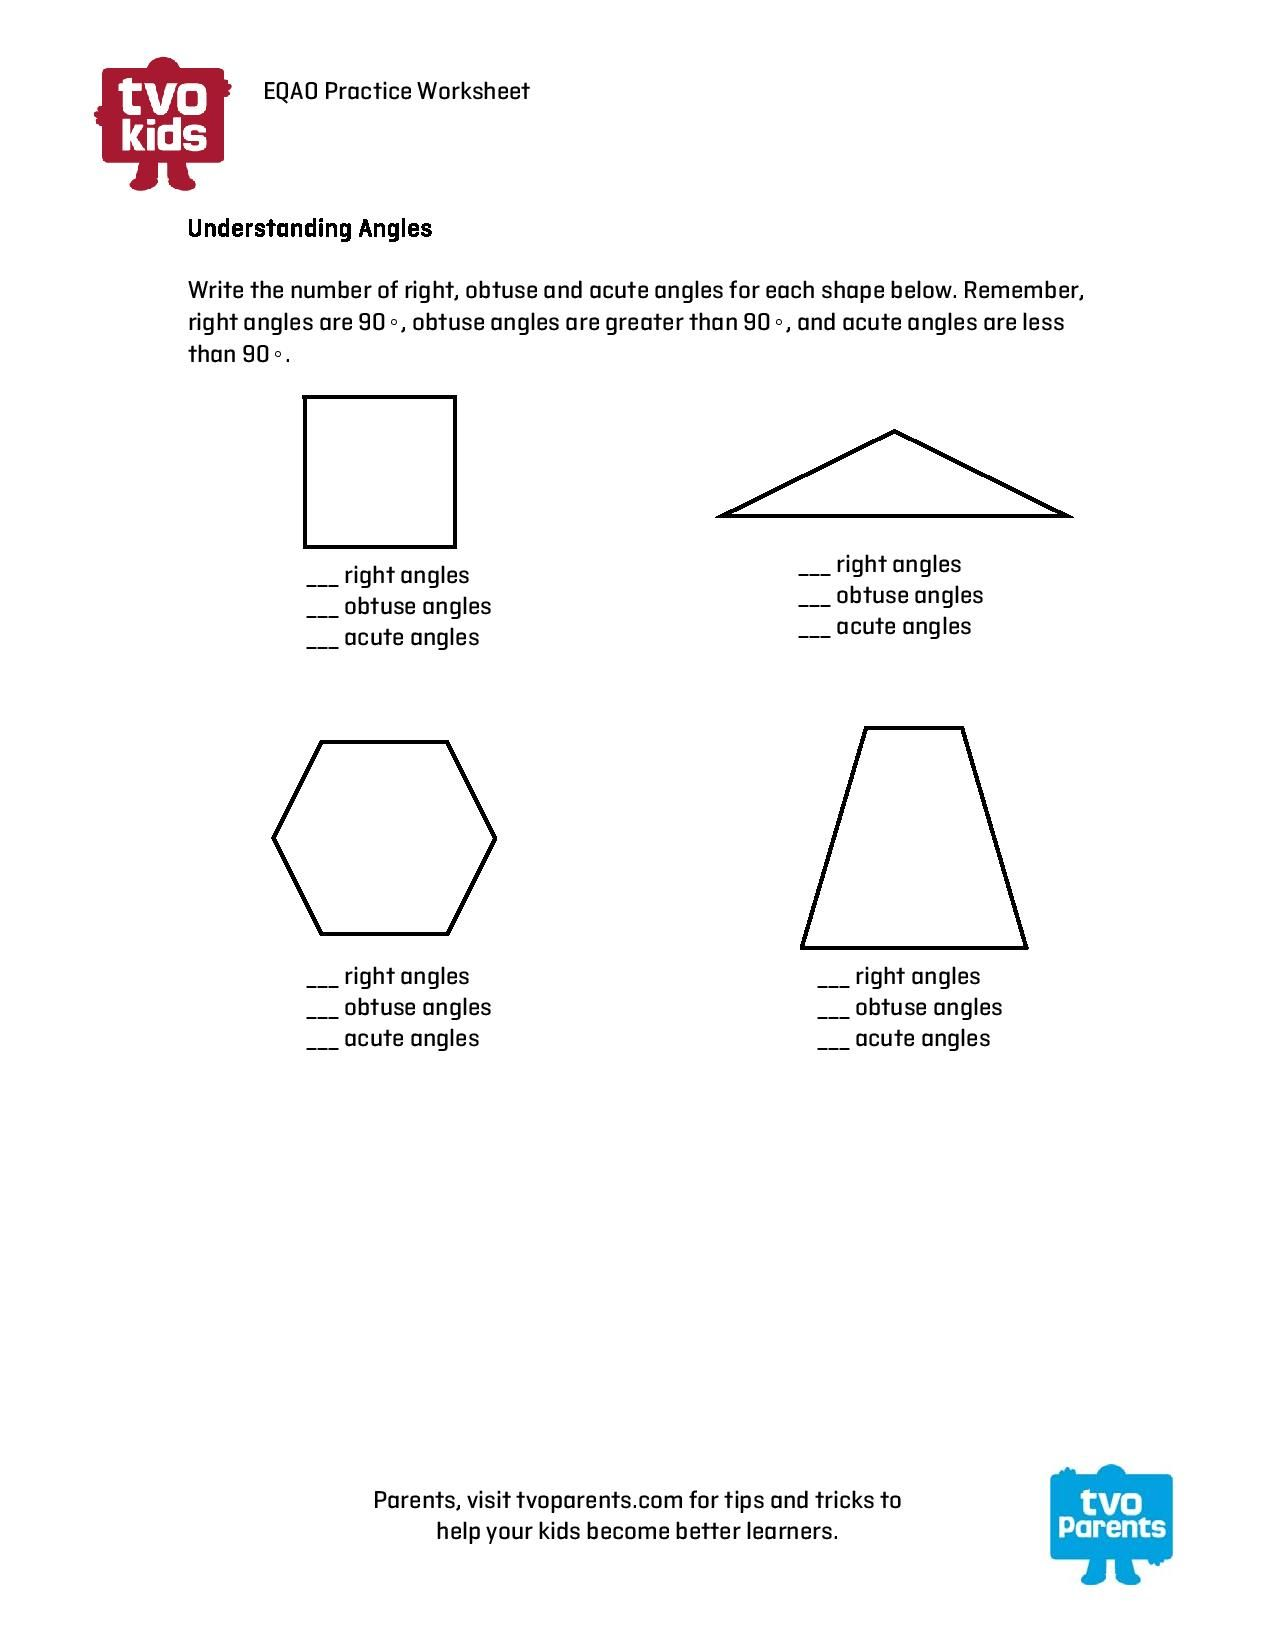 worksheet Eqao Grade 3 Worksheets understanding angles worksheet for grade 6 printdownload here eqao 6